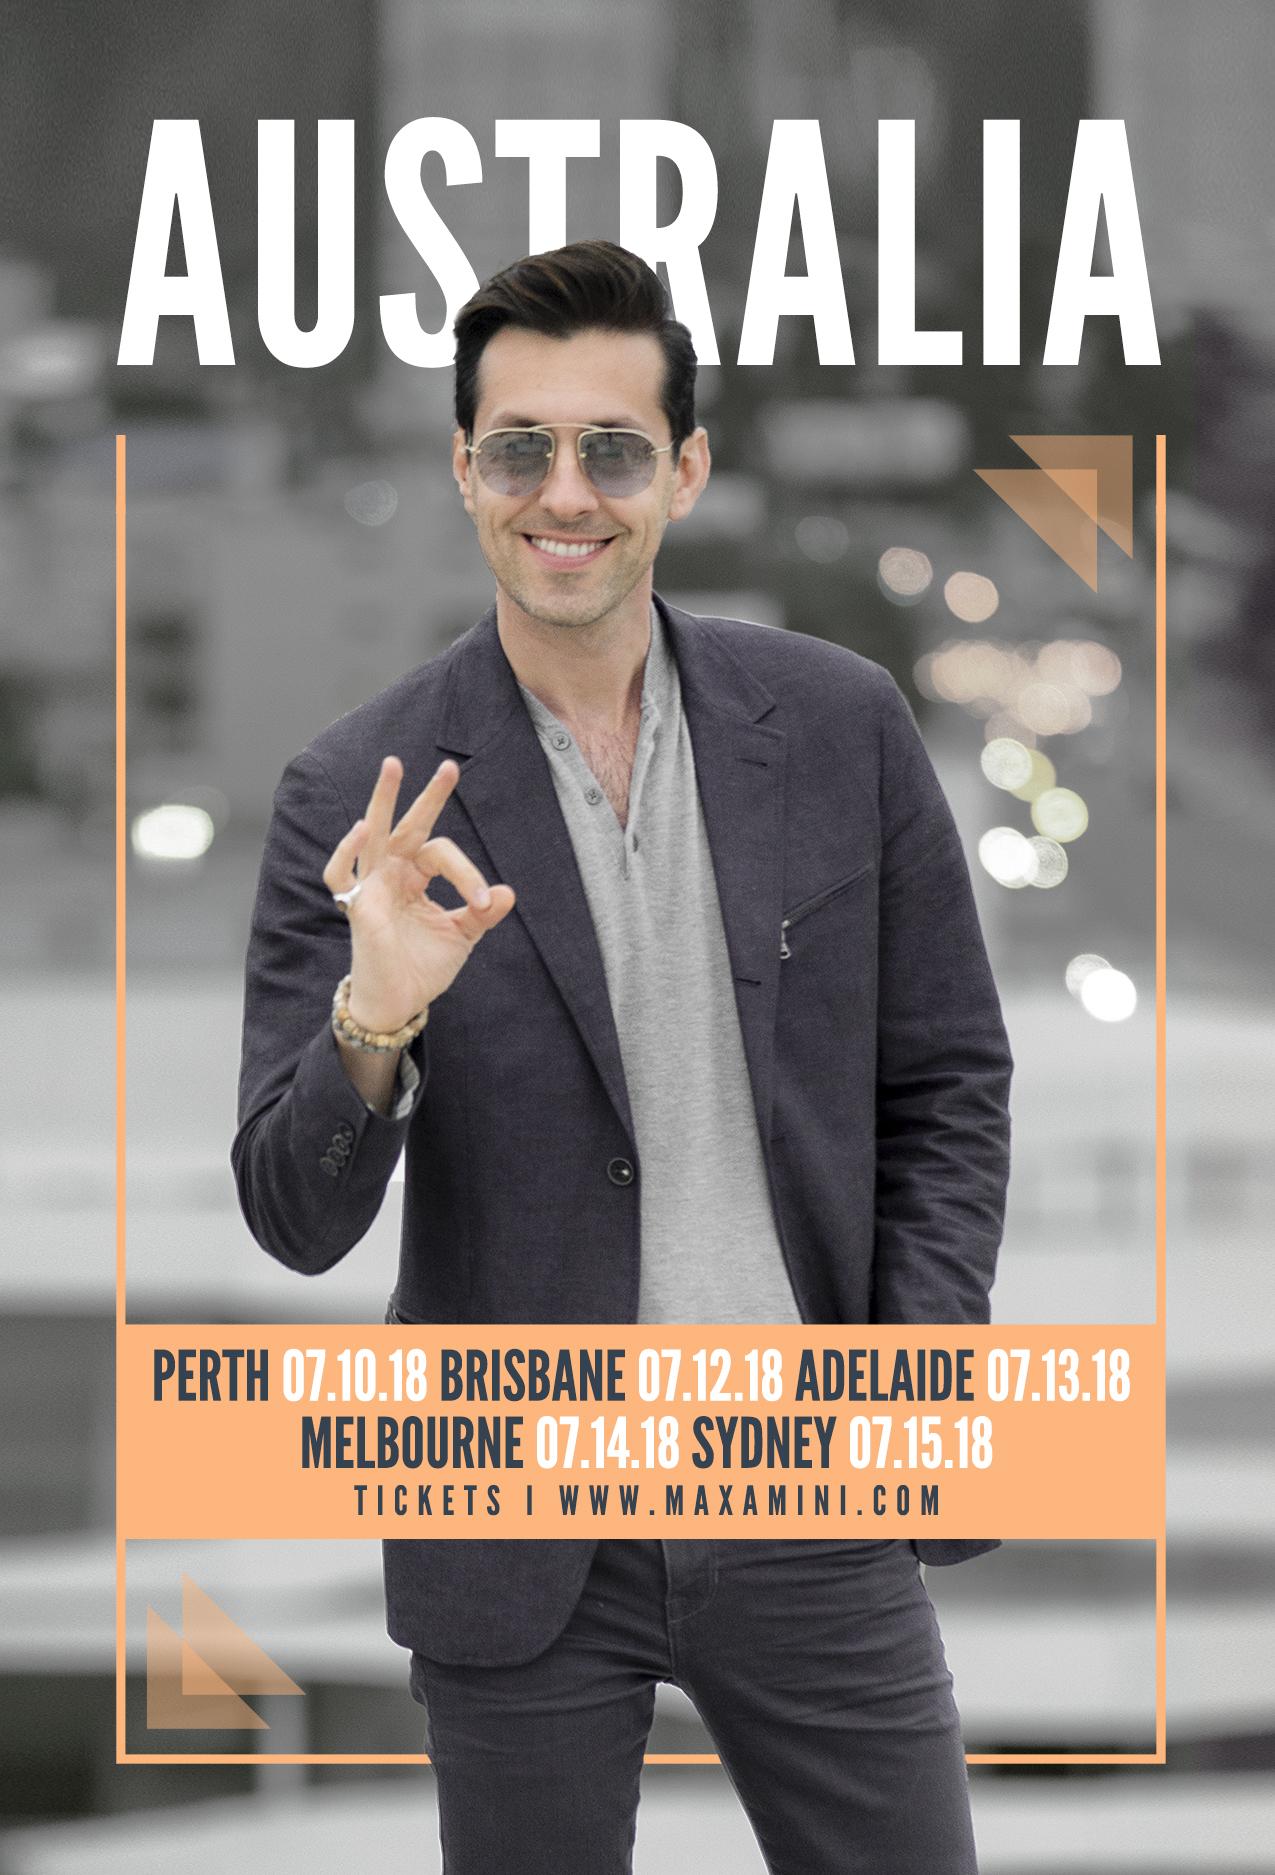 Australia_4x6_All_Shows.jpg